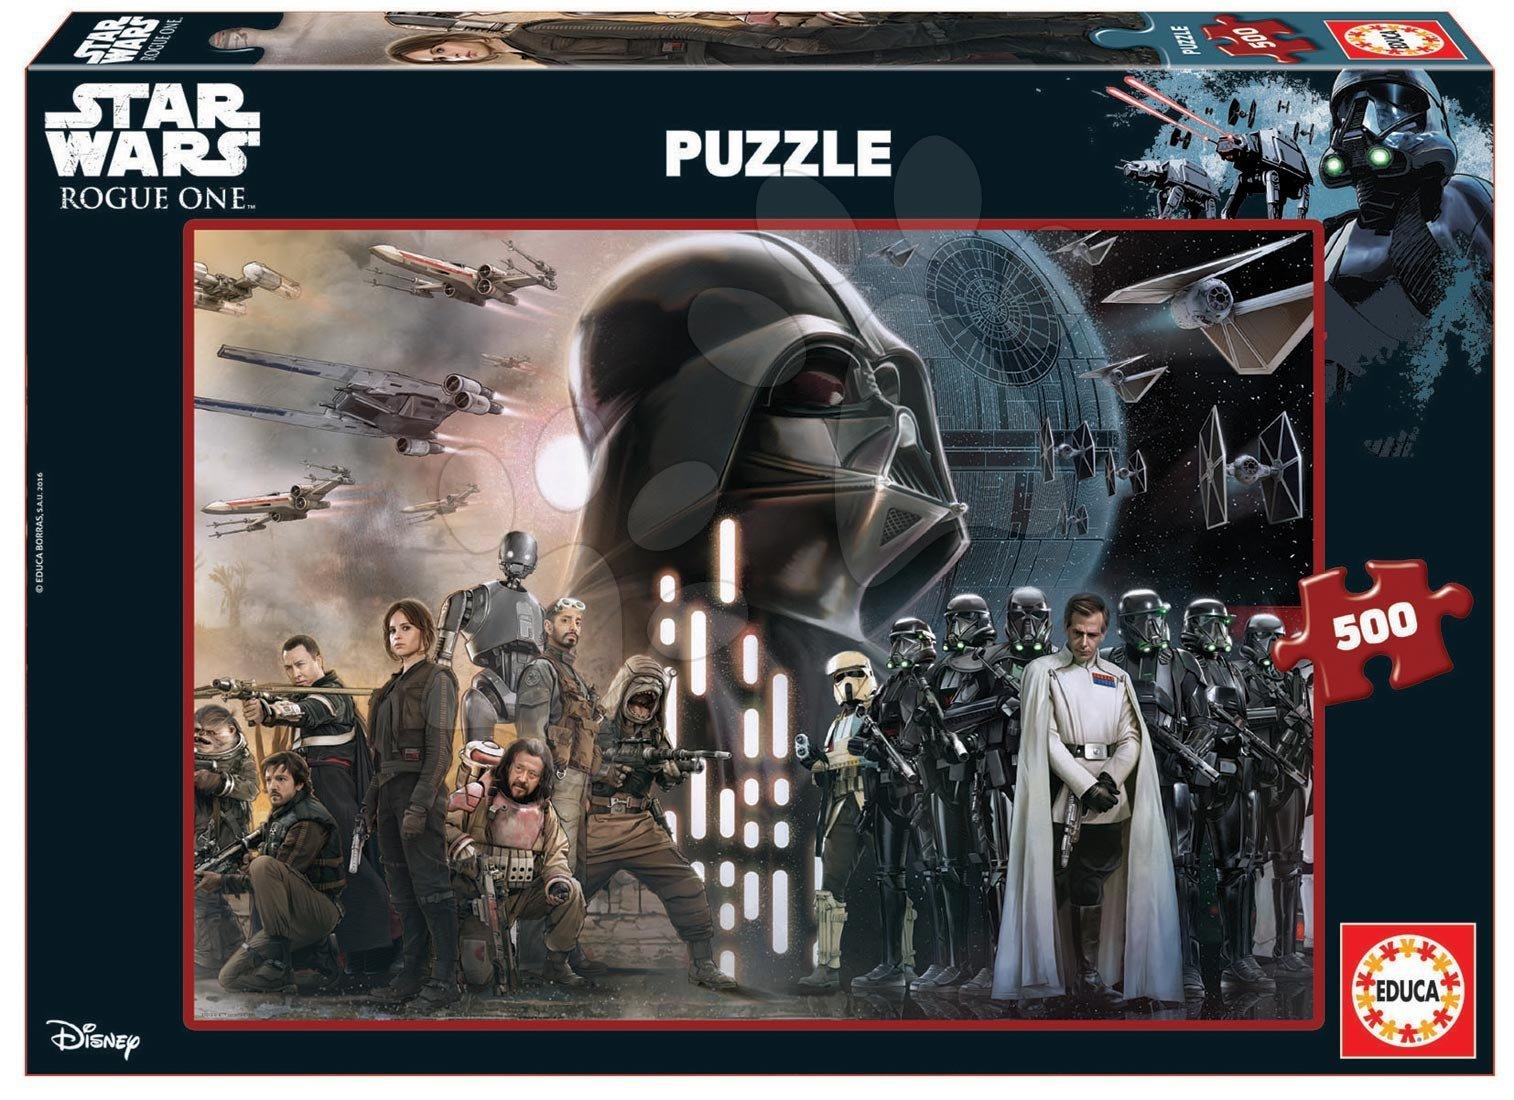 Puzzle Star Wars Story-Rouge One Educa 500 dílů od 11 let